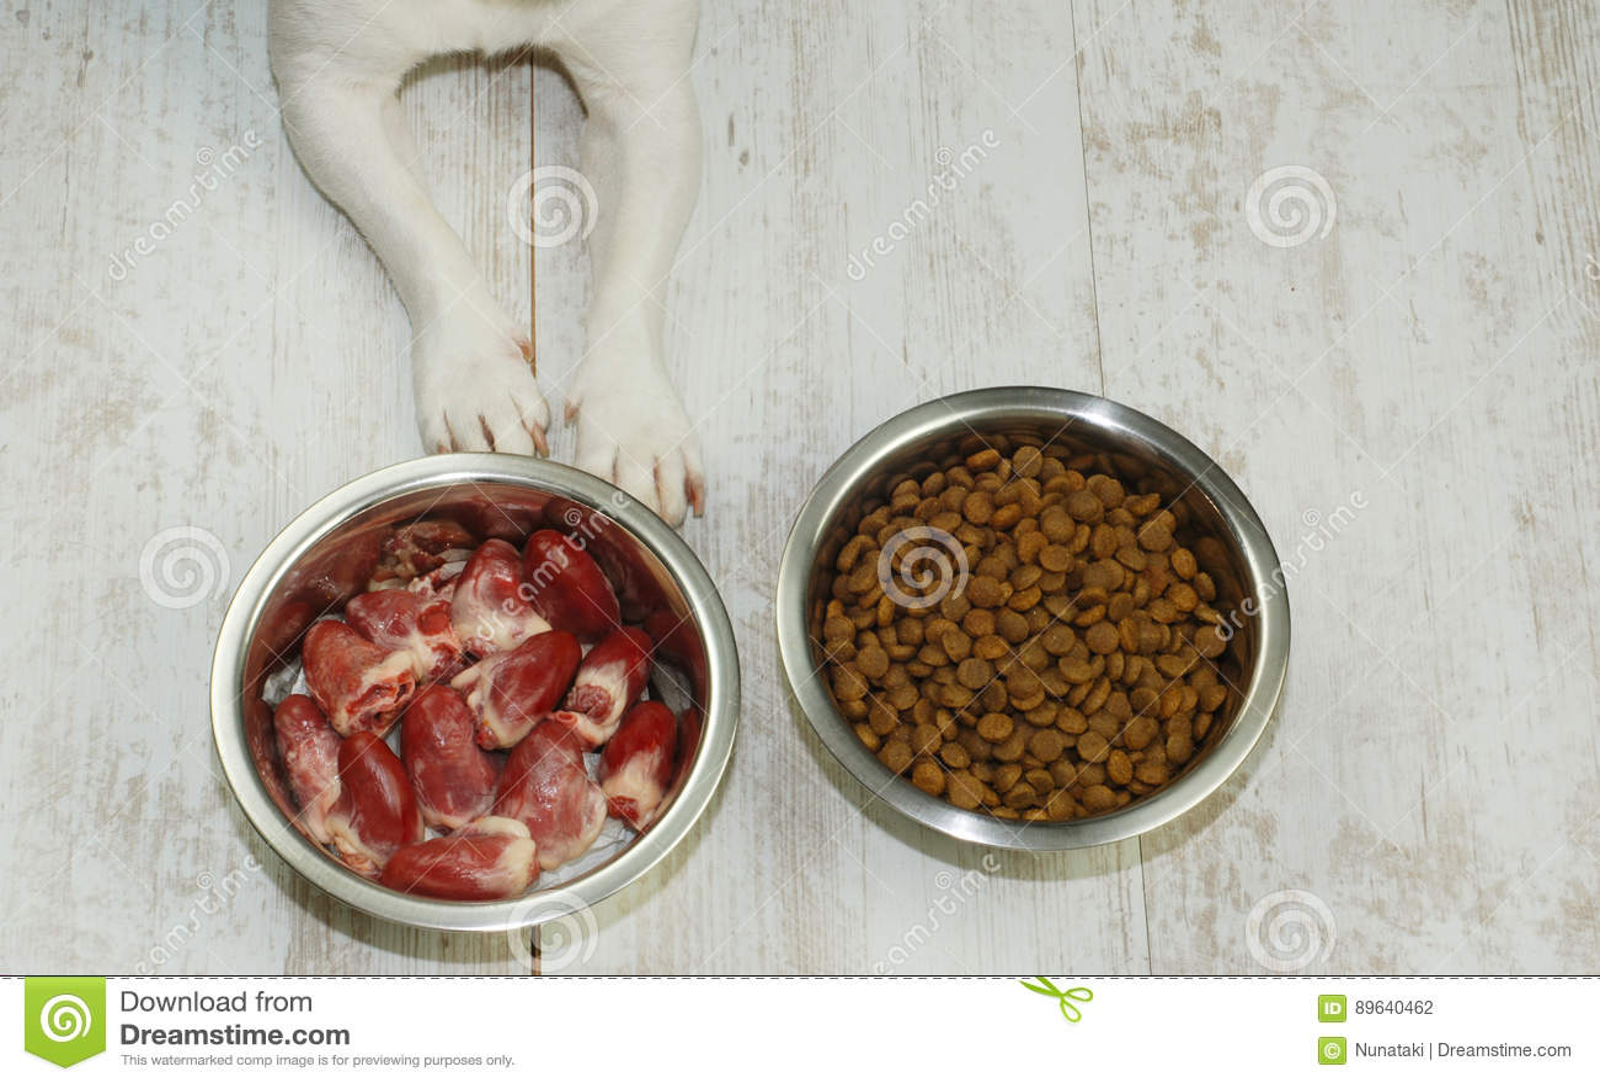 Dry Dog Food Vegetarian